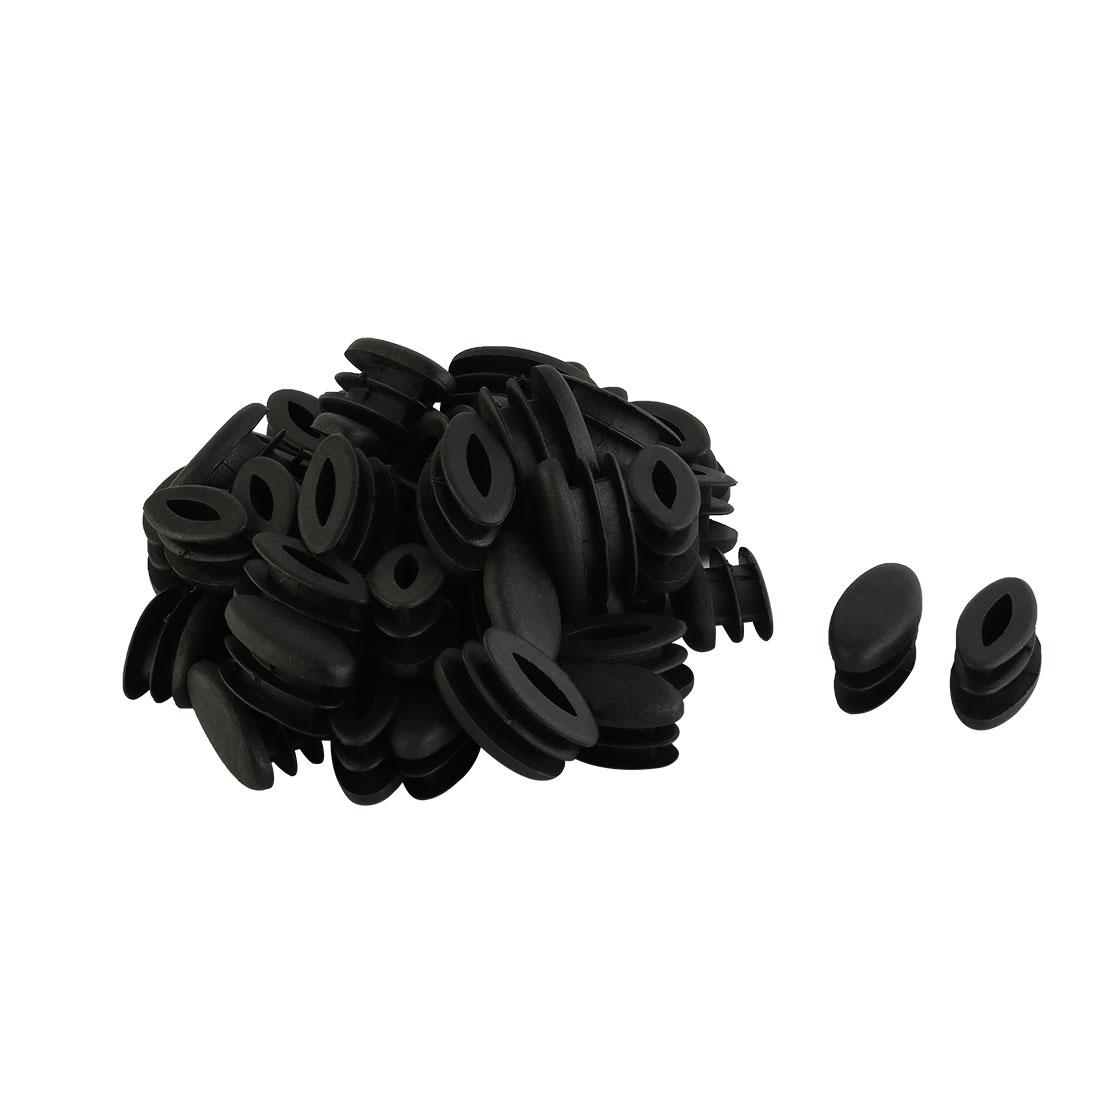 Table Feet Plastic Oval Design Tube Pipe Insert End Cap Black 15mm x 30mm 50 PCS